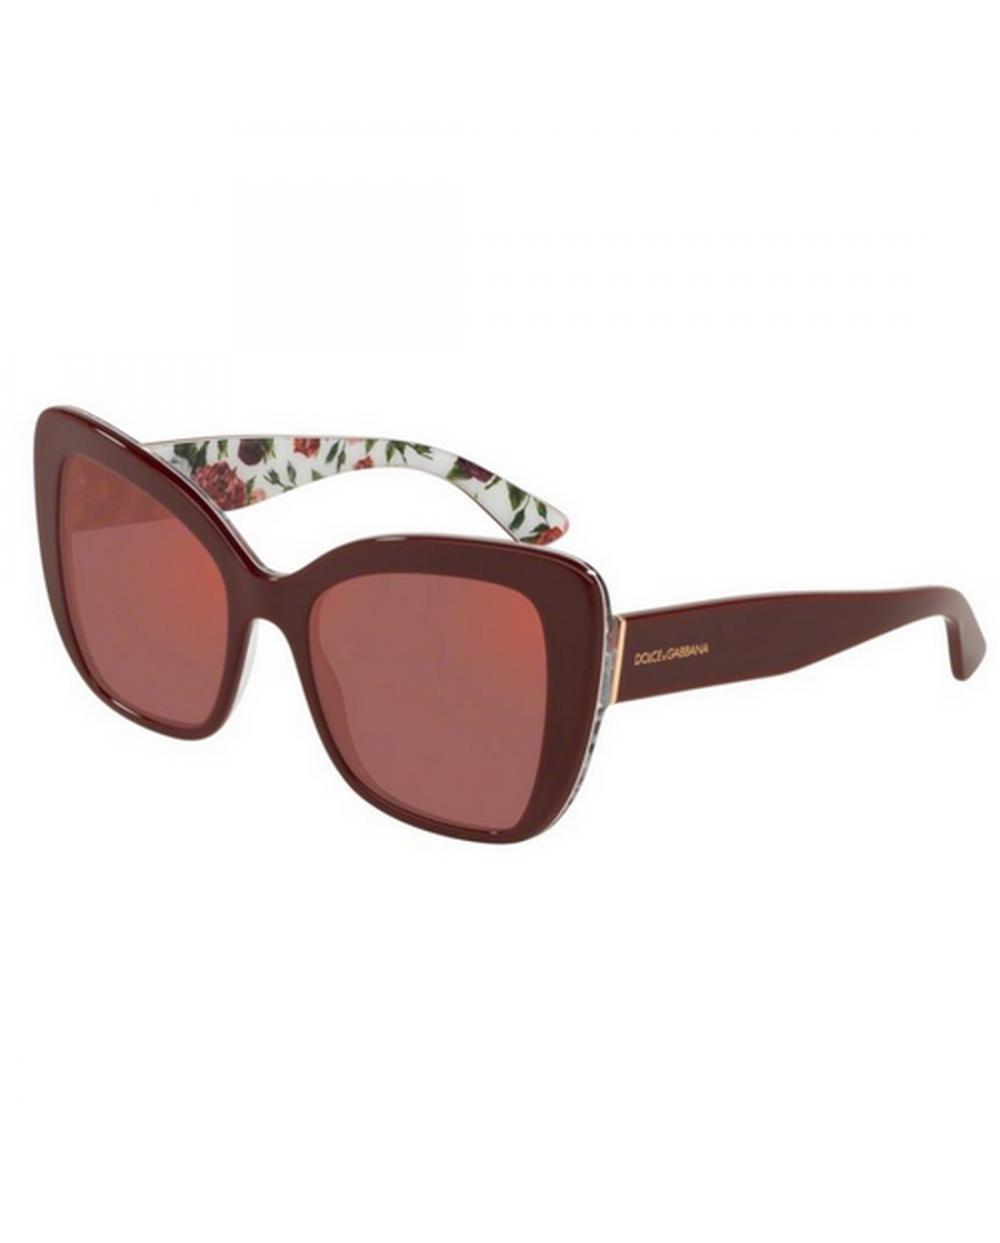 6c8a2a1fa00c Glasses sun Dolce Gabbana DG 4348 original warranty